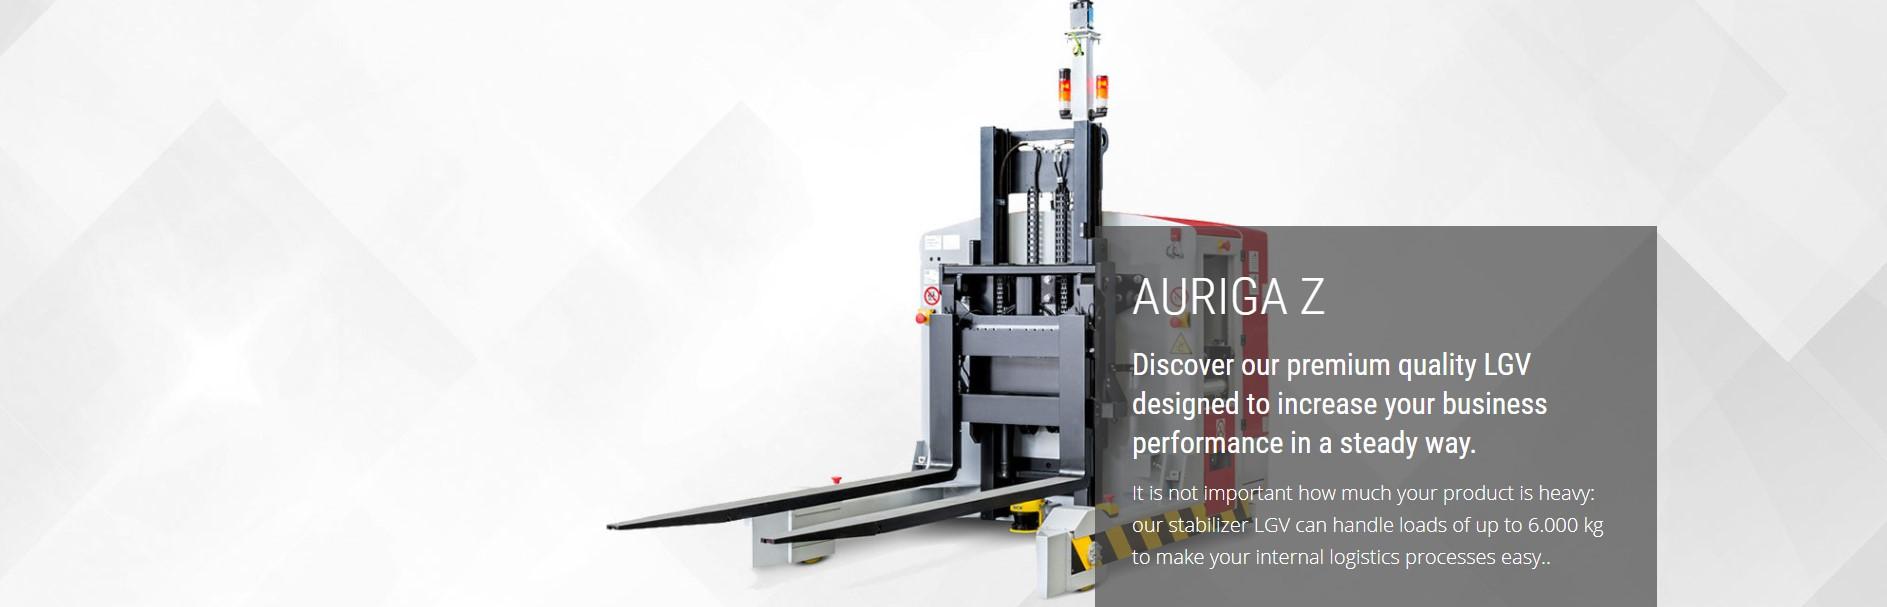 Auriga Z laser guided vehicle